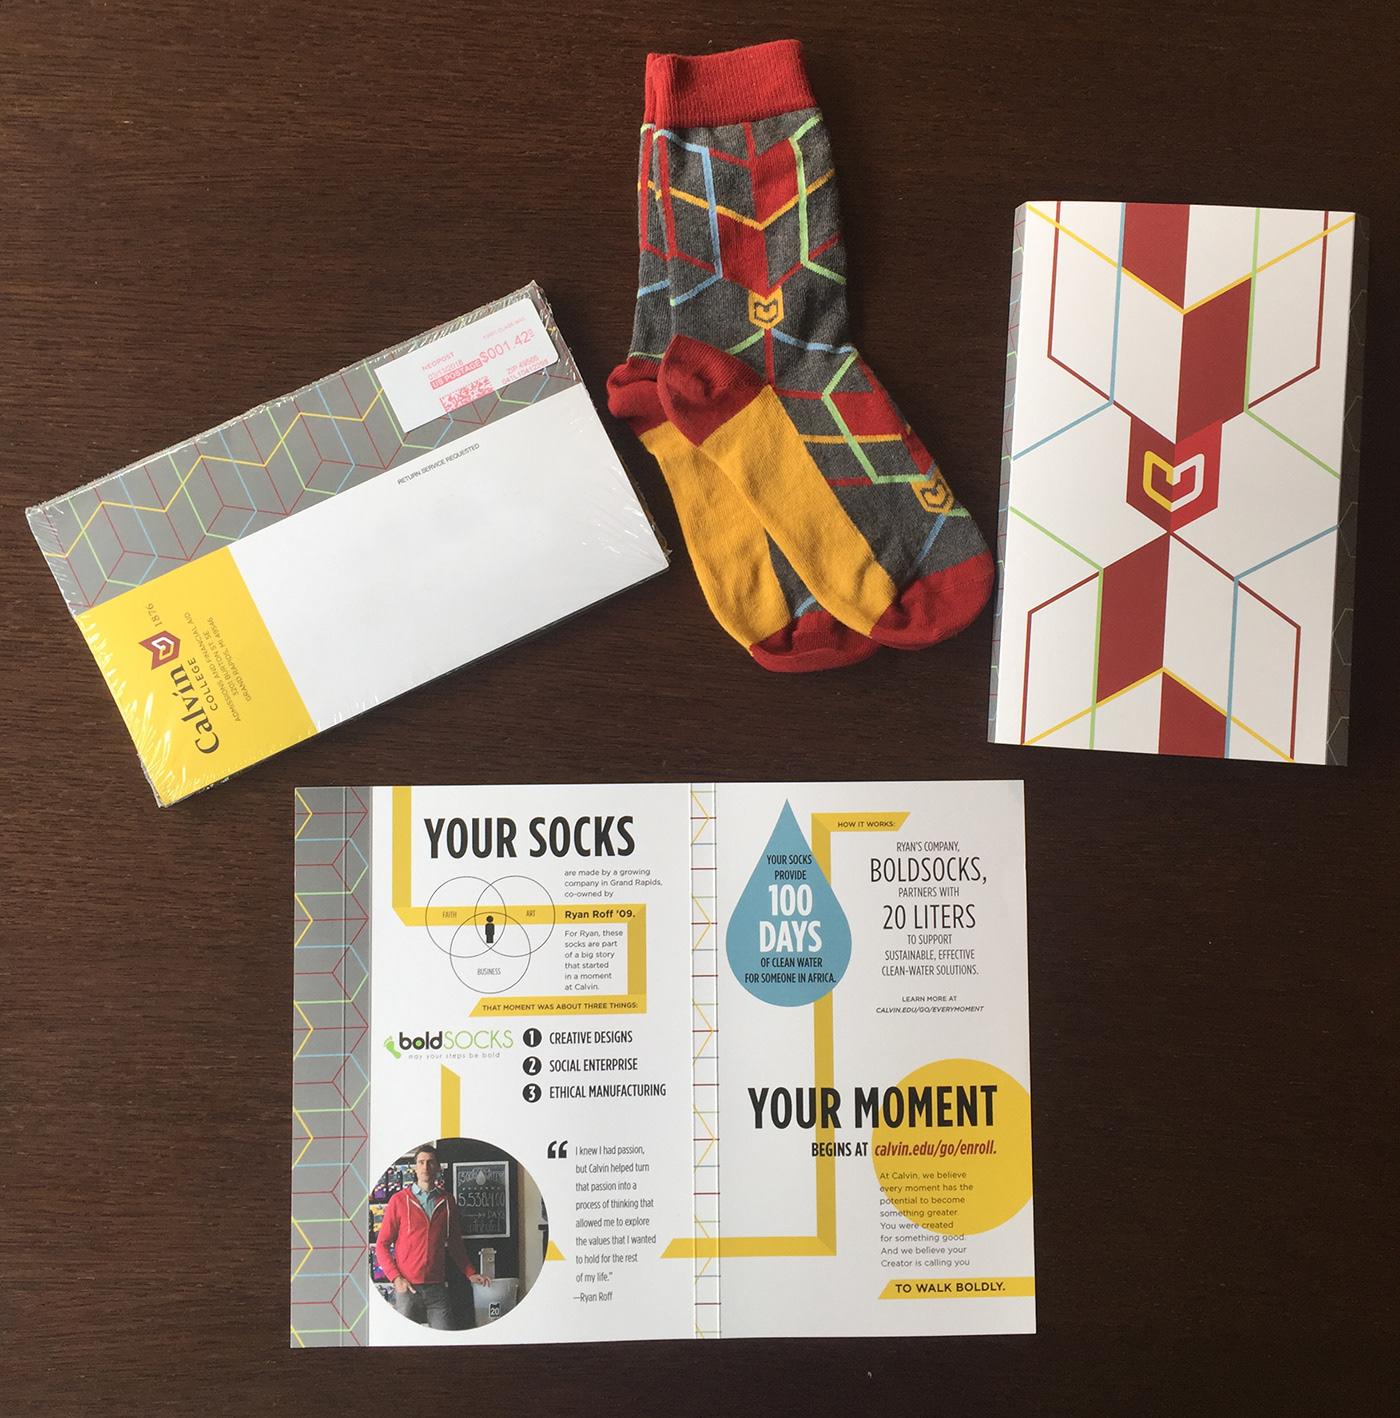 college University campaign multichannel campaign socks